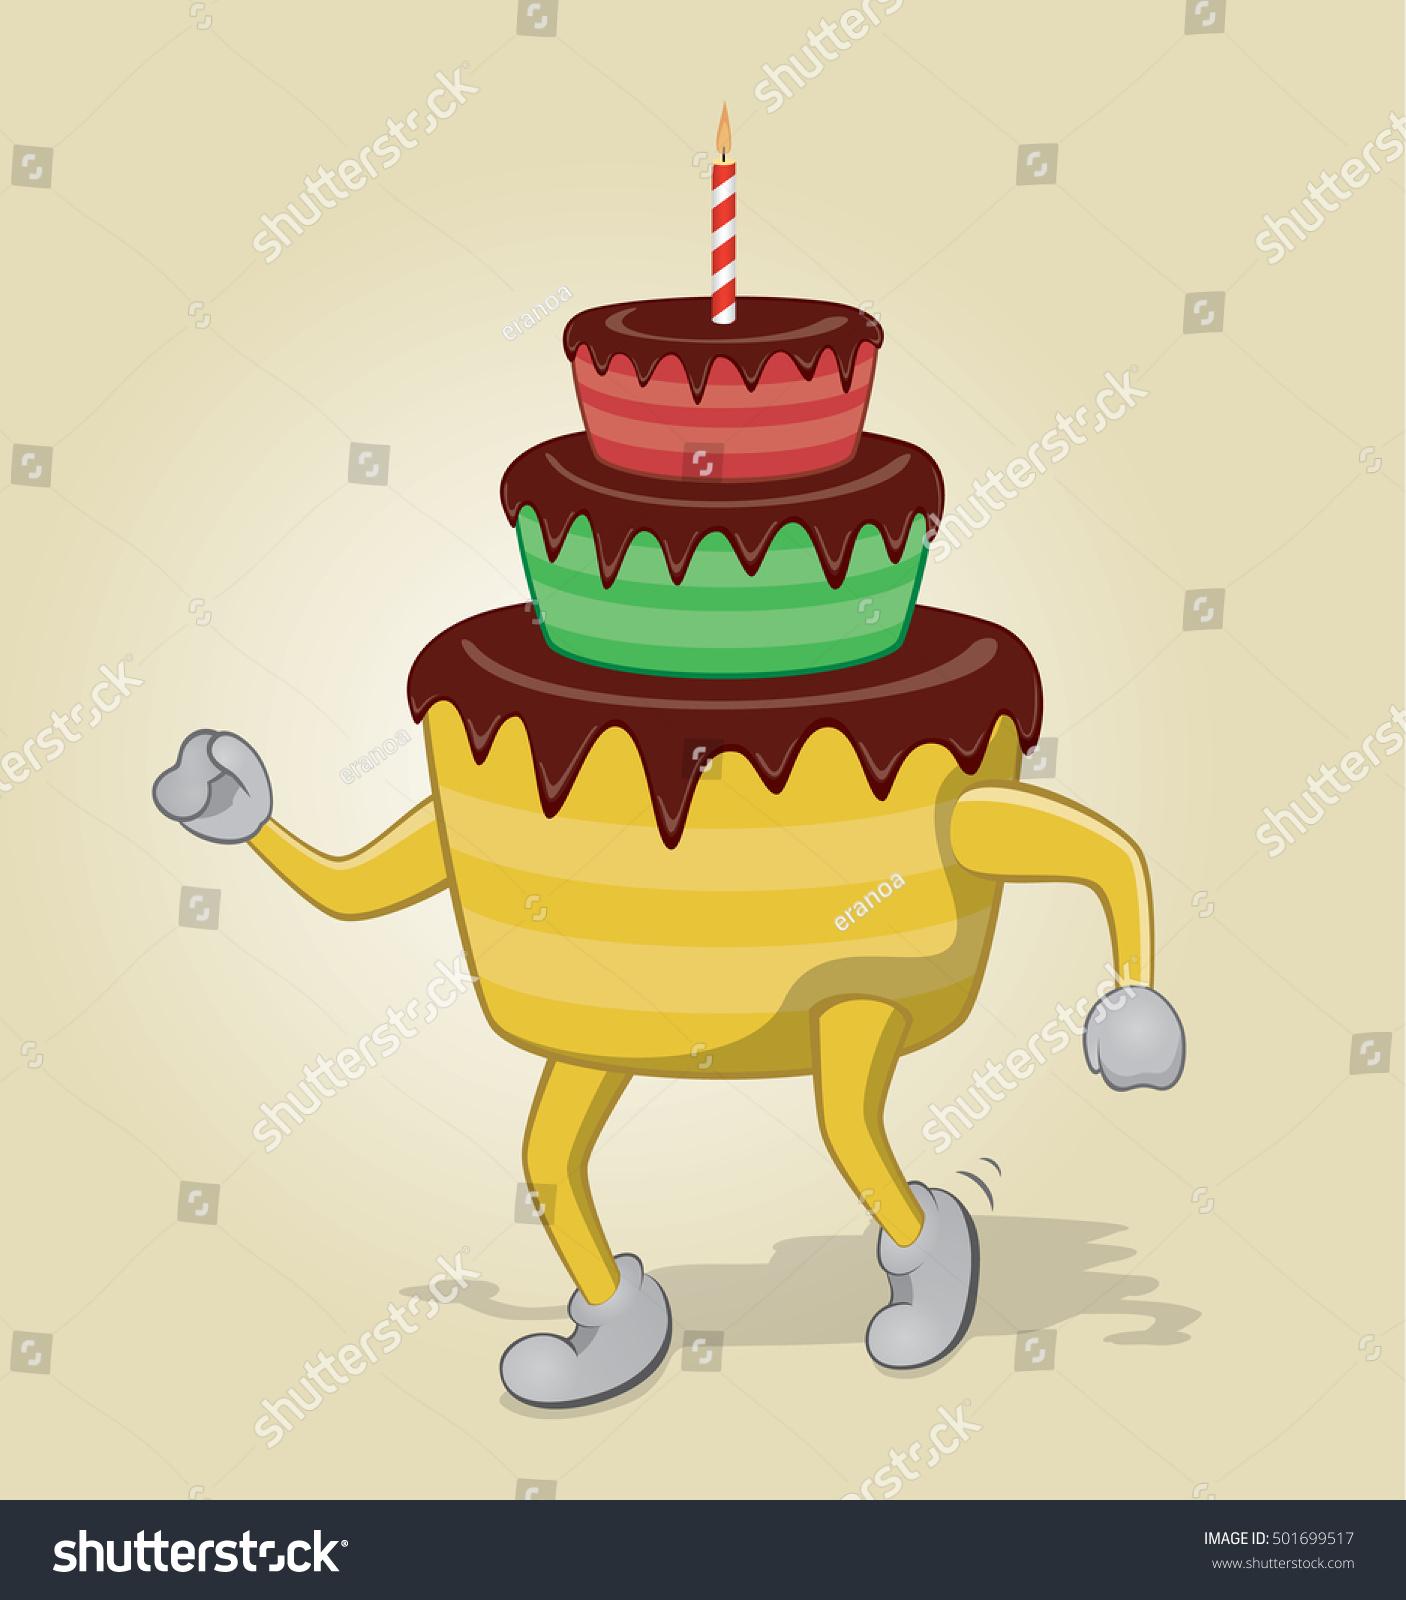 Tremendous Dancing Birthday Cake Stock Vector Royalty Free 501699517 Personalised Birthday Cards Cominlily Jamesorg